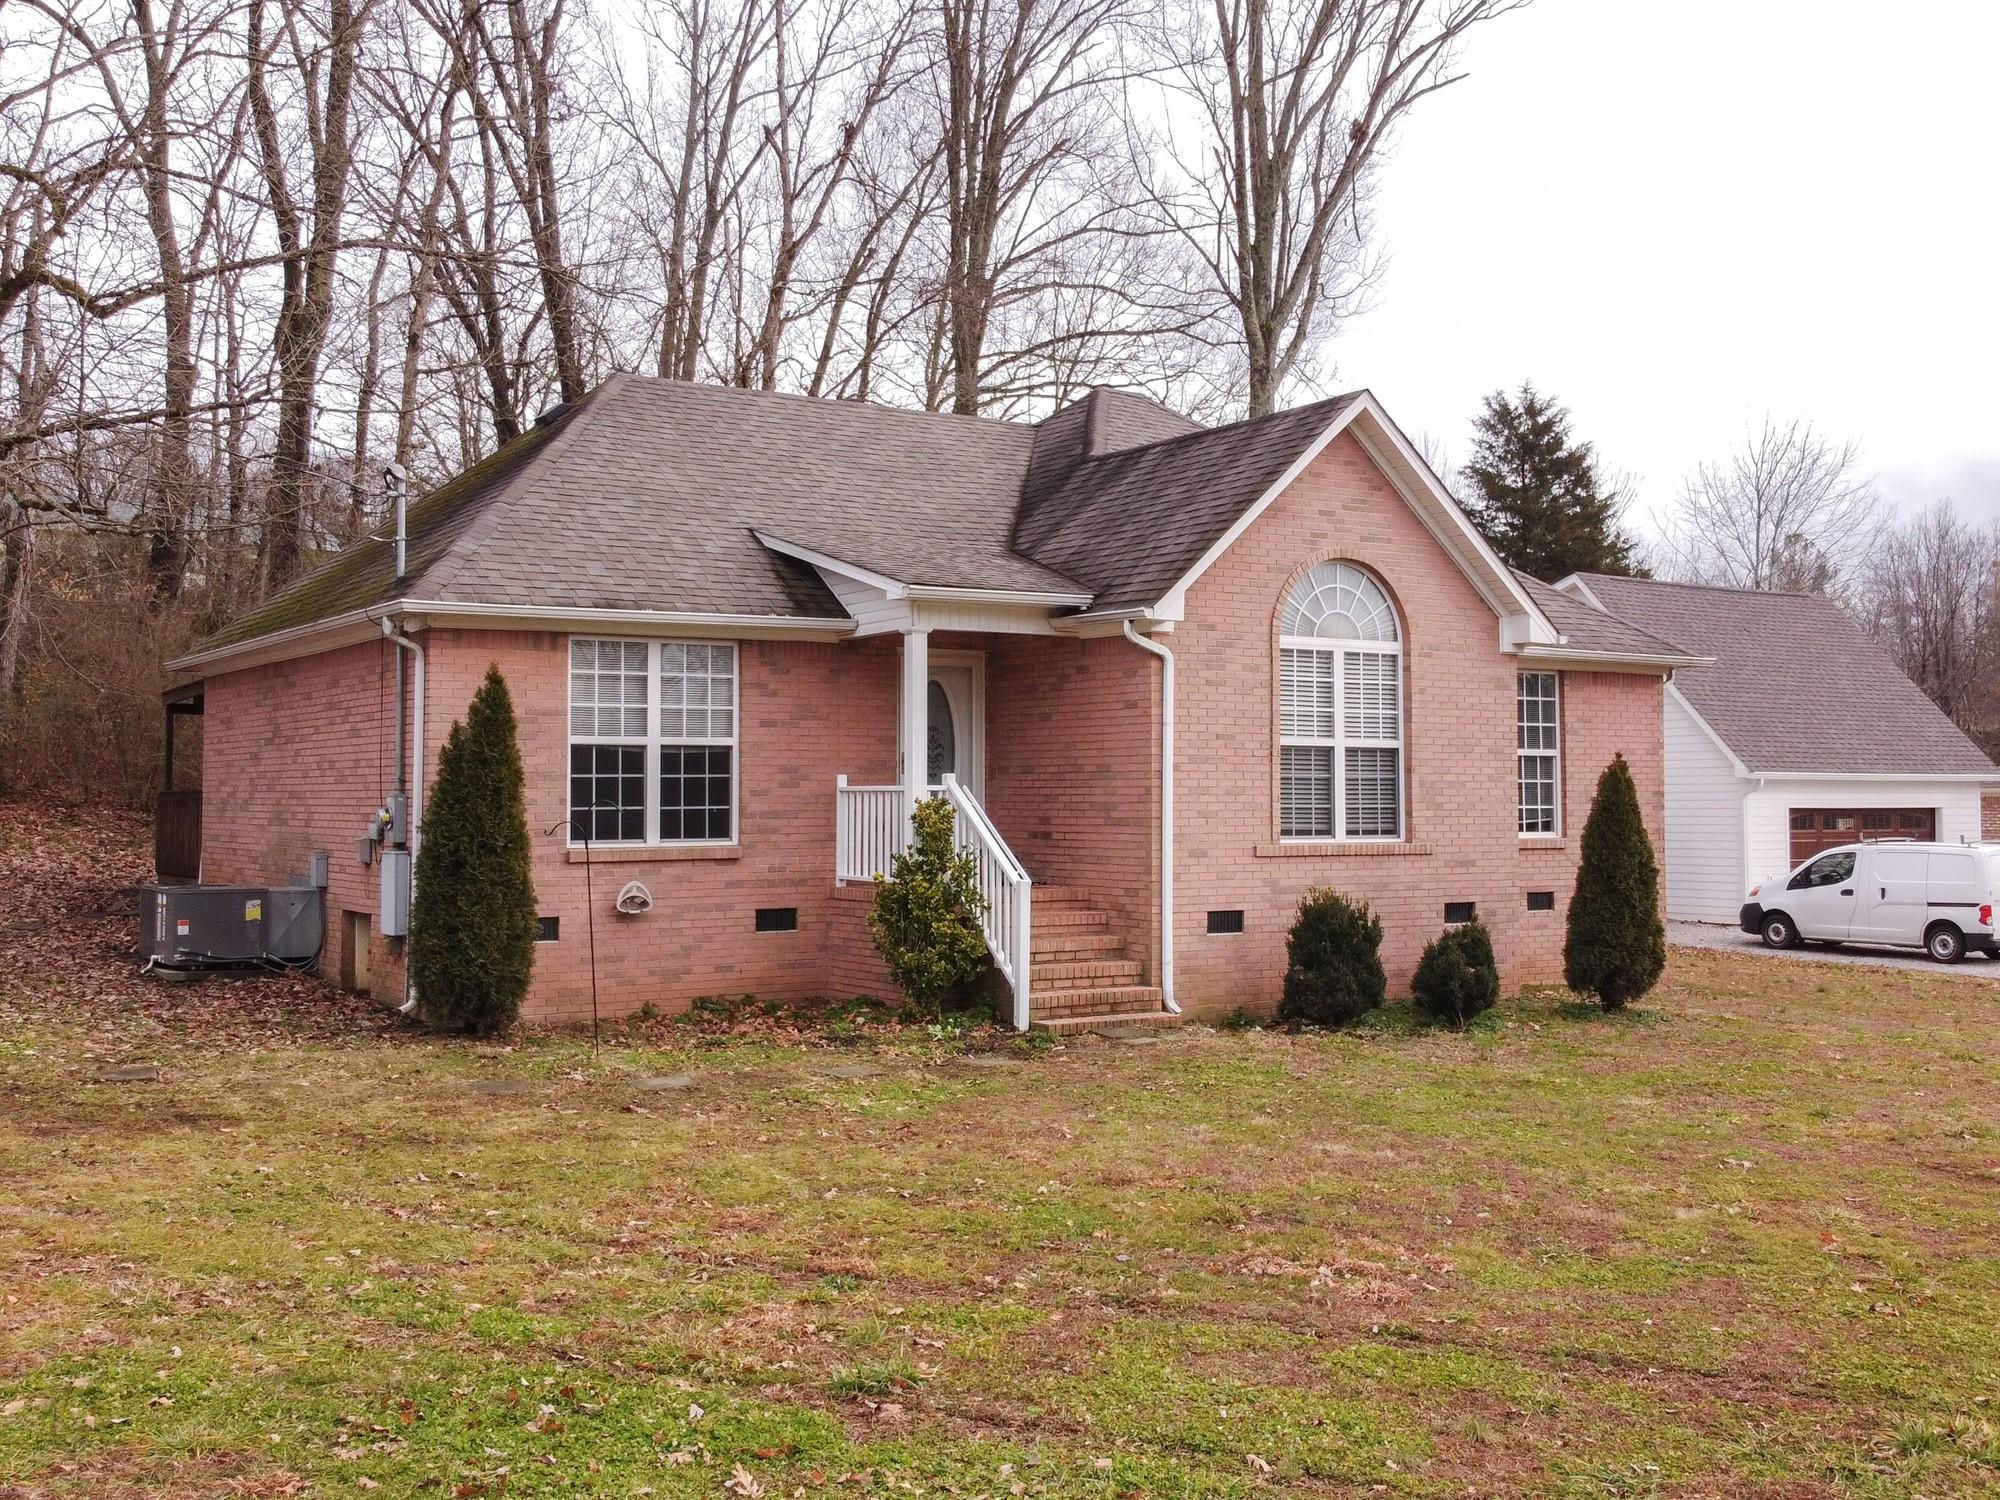 2644 Owens Dr Property Photo - Santa Fe, TN real estate listing